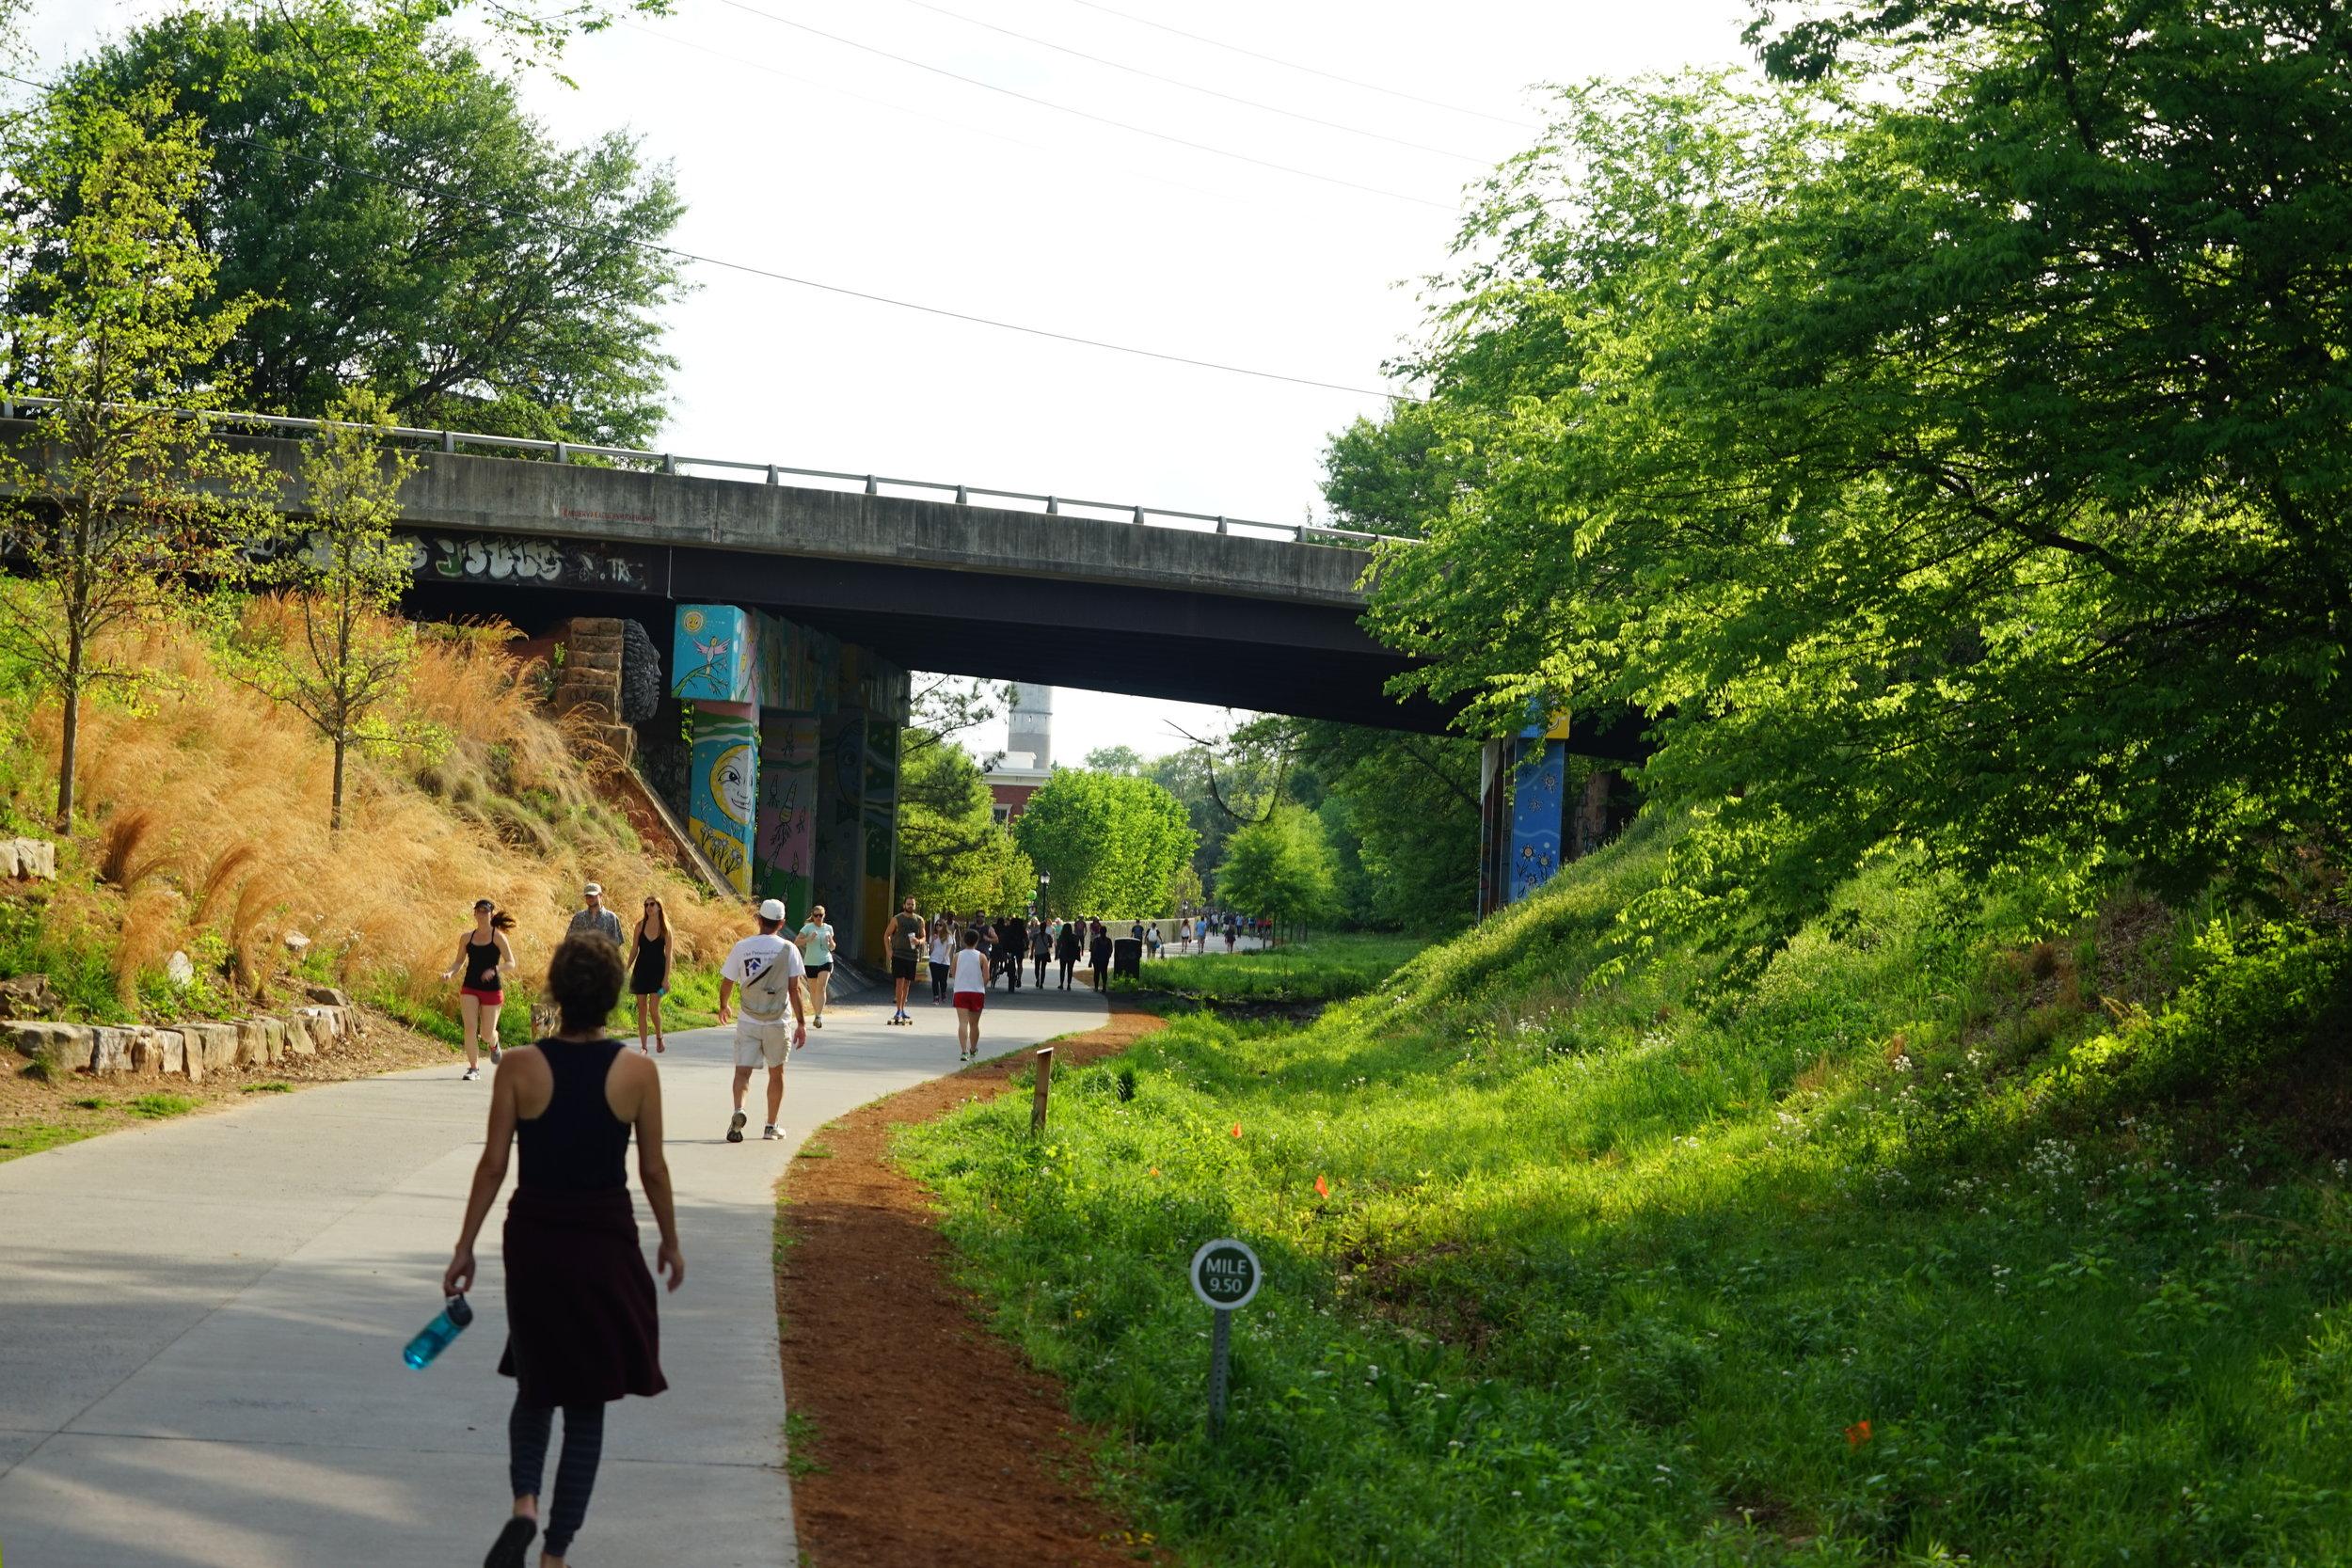 Walking the Atlanta Beltline